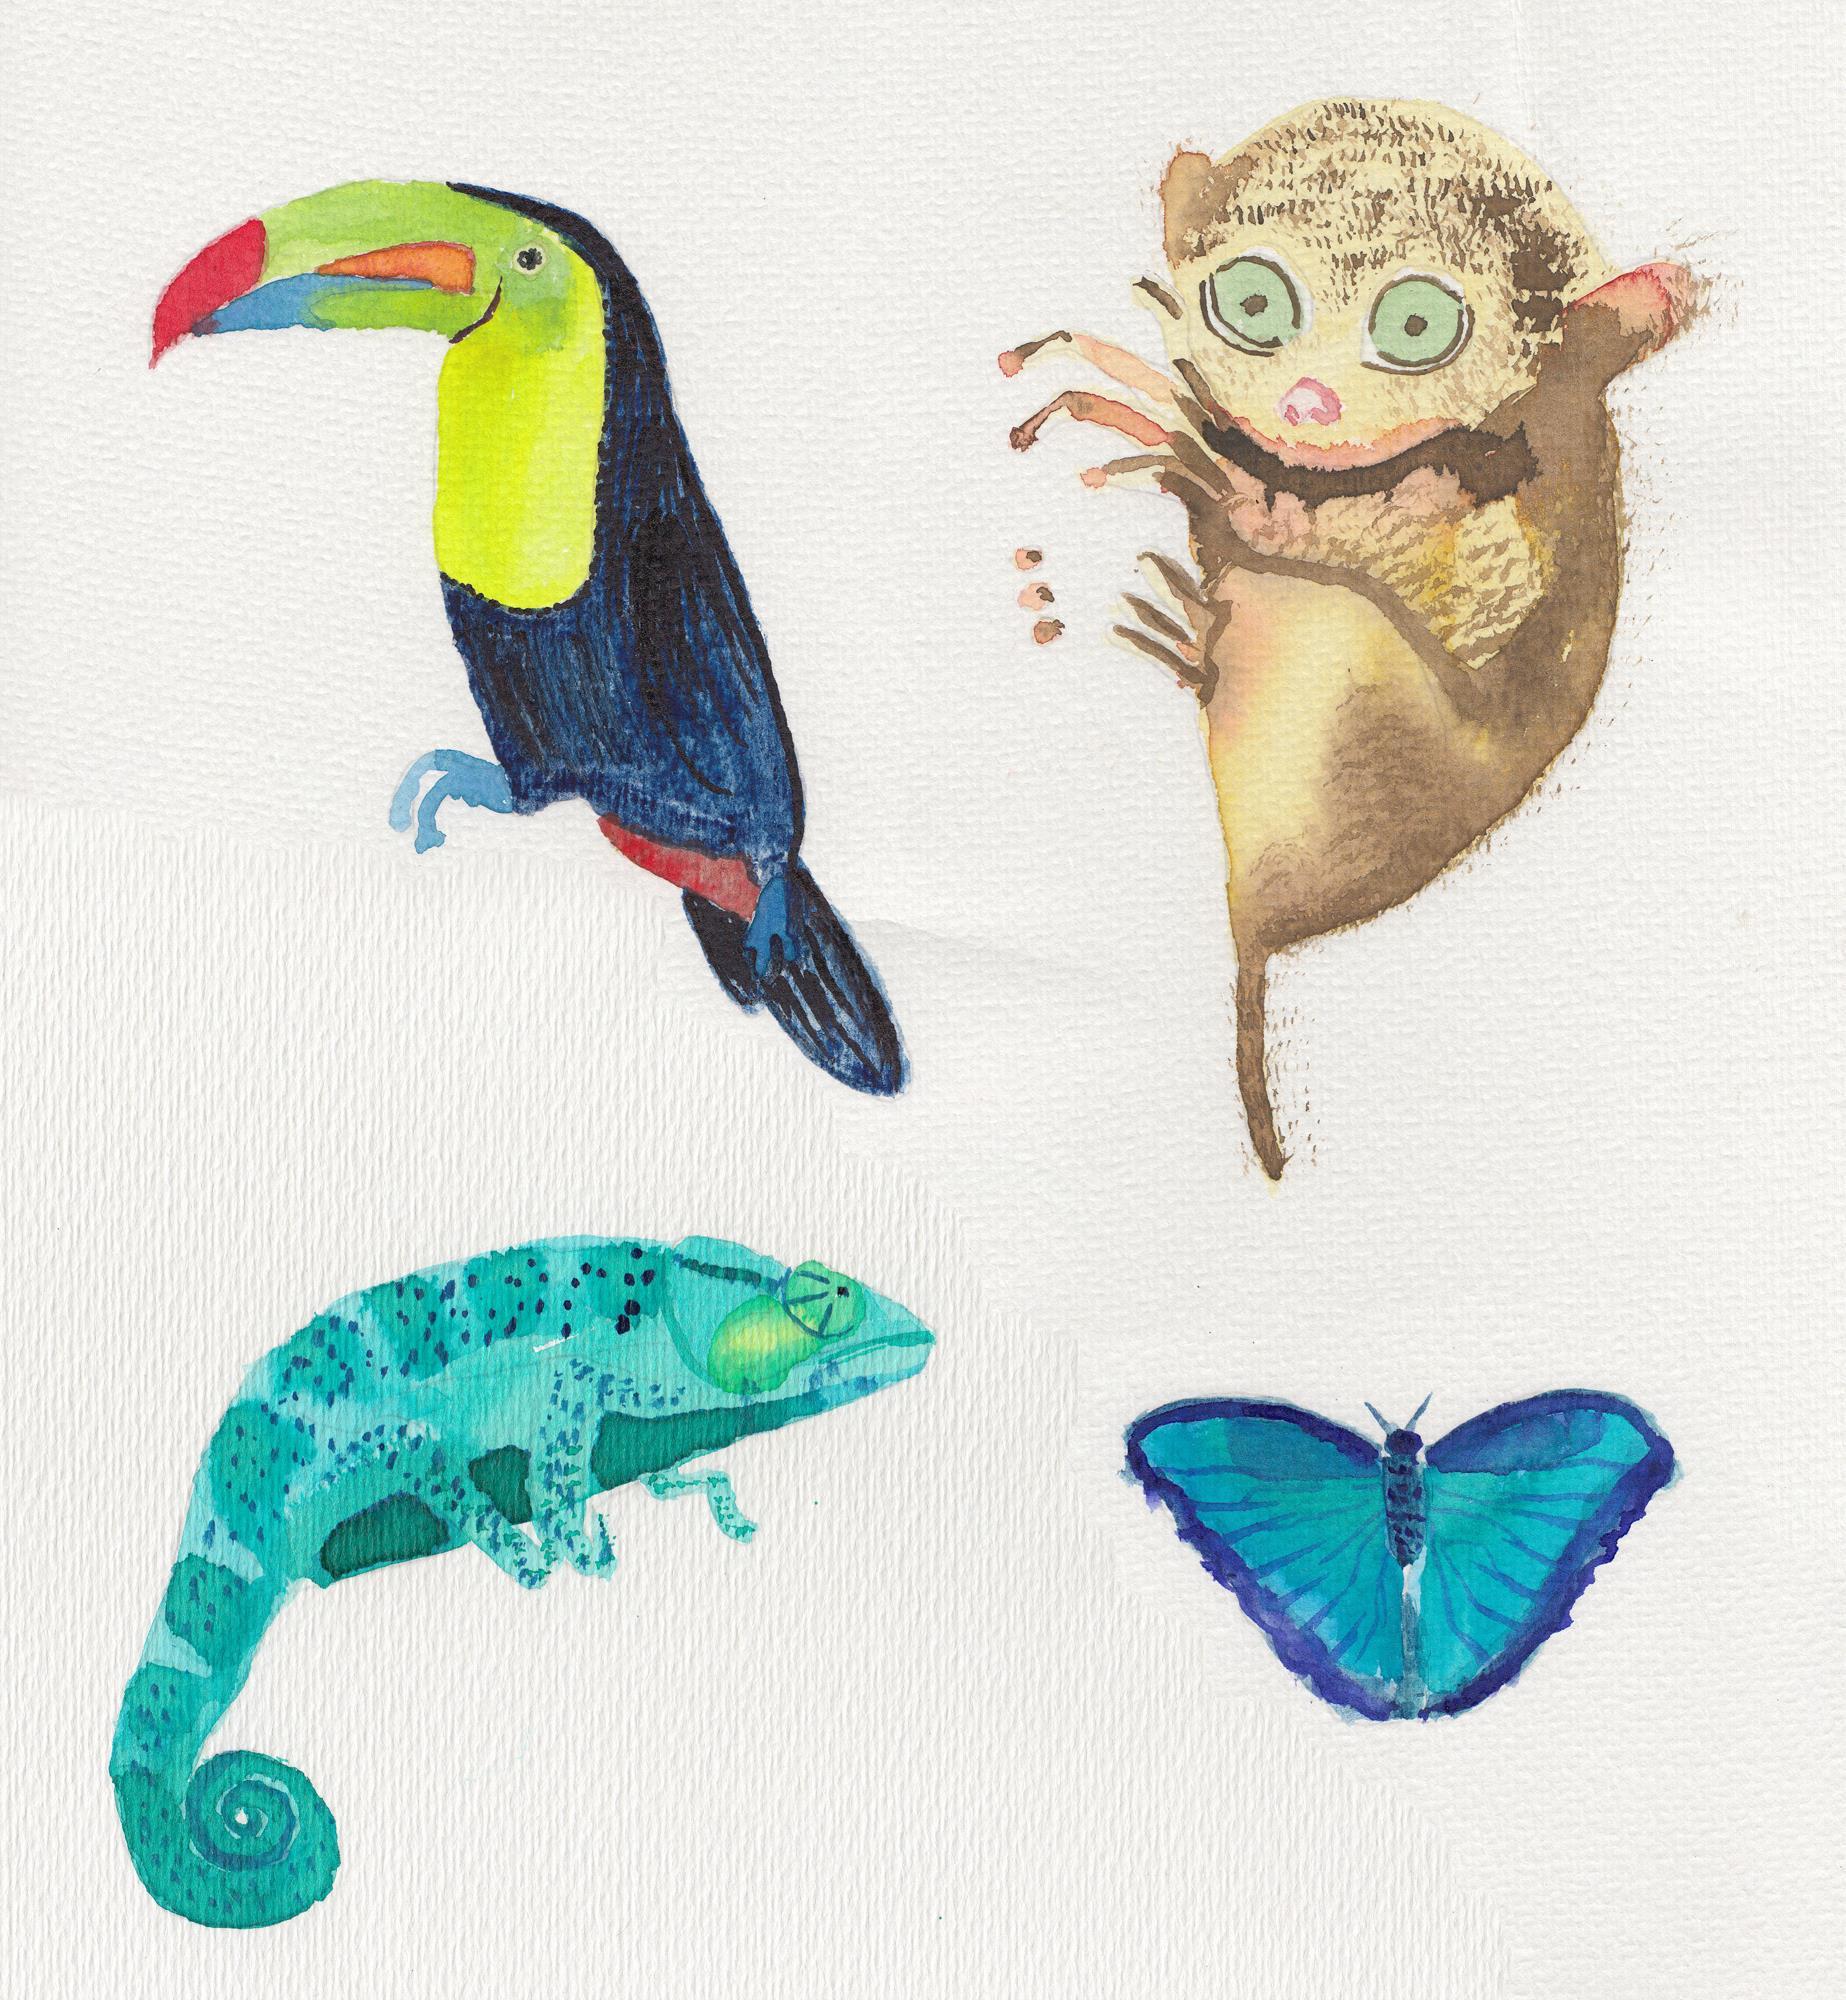 acuarela-camaleon-lemur-tucan-tropical (2)